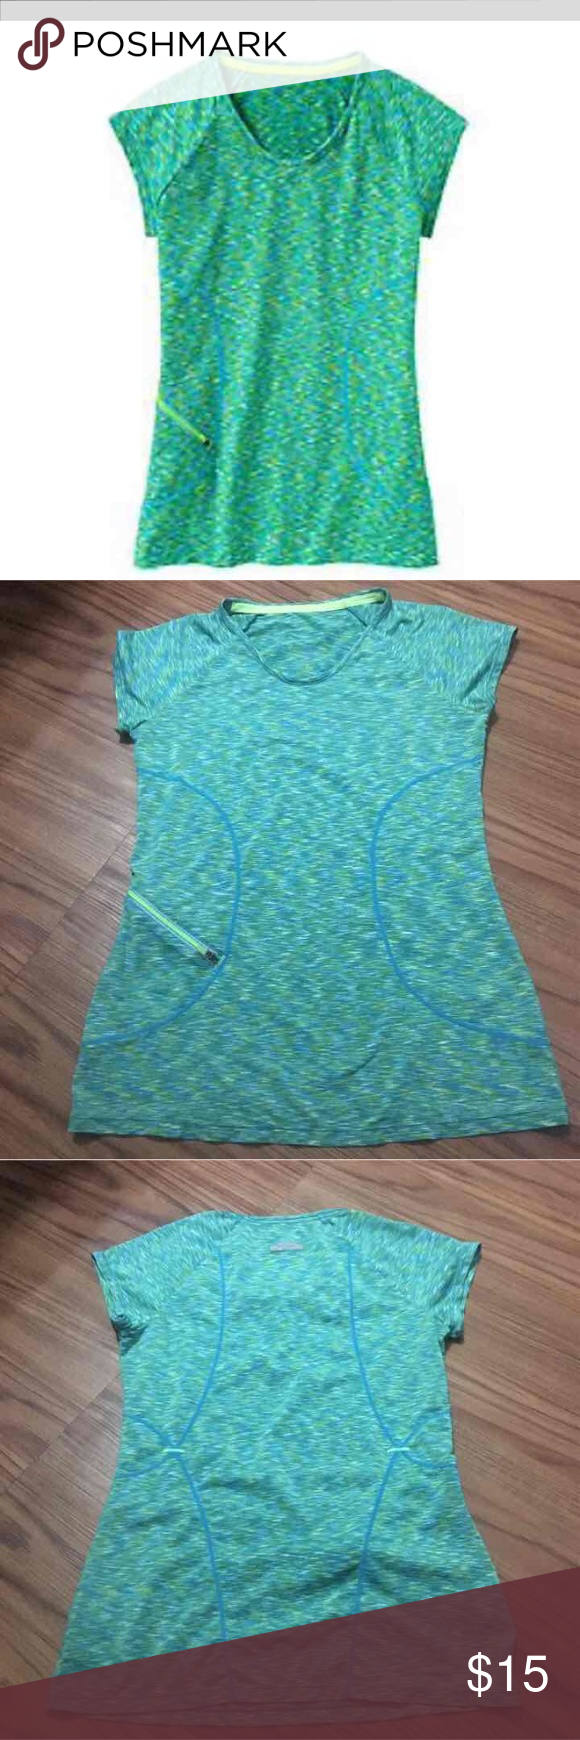 Athleta shirt Excellent condition size XS runs big like size S Athleta Tops Tees - Short Sleeve